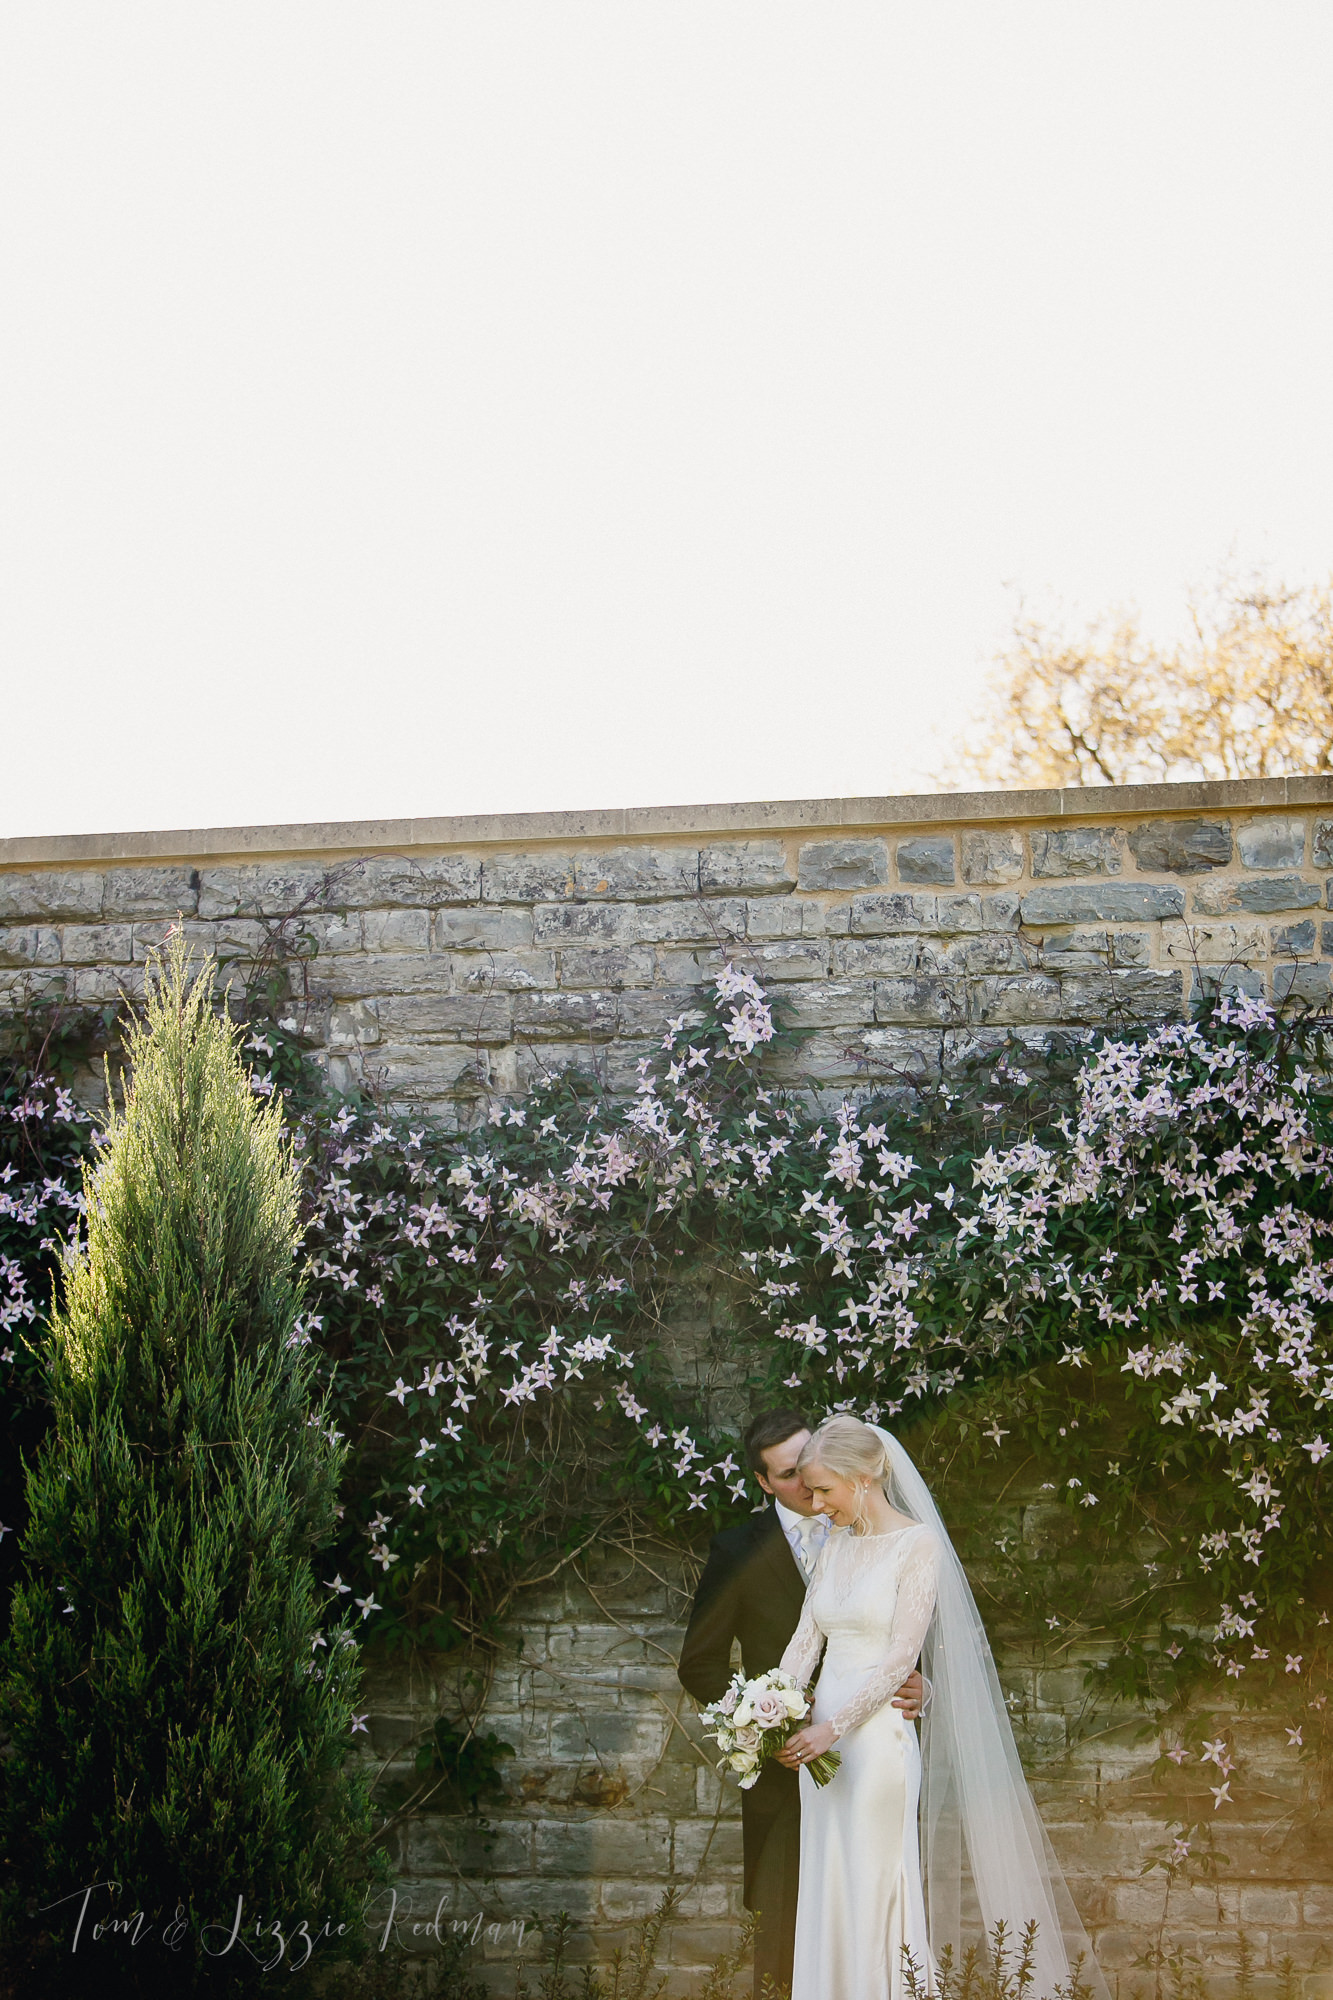 Dorset wedding photographers Tom & Lizzie Redman 050.jpg